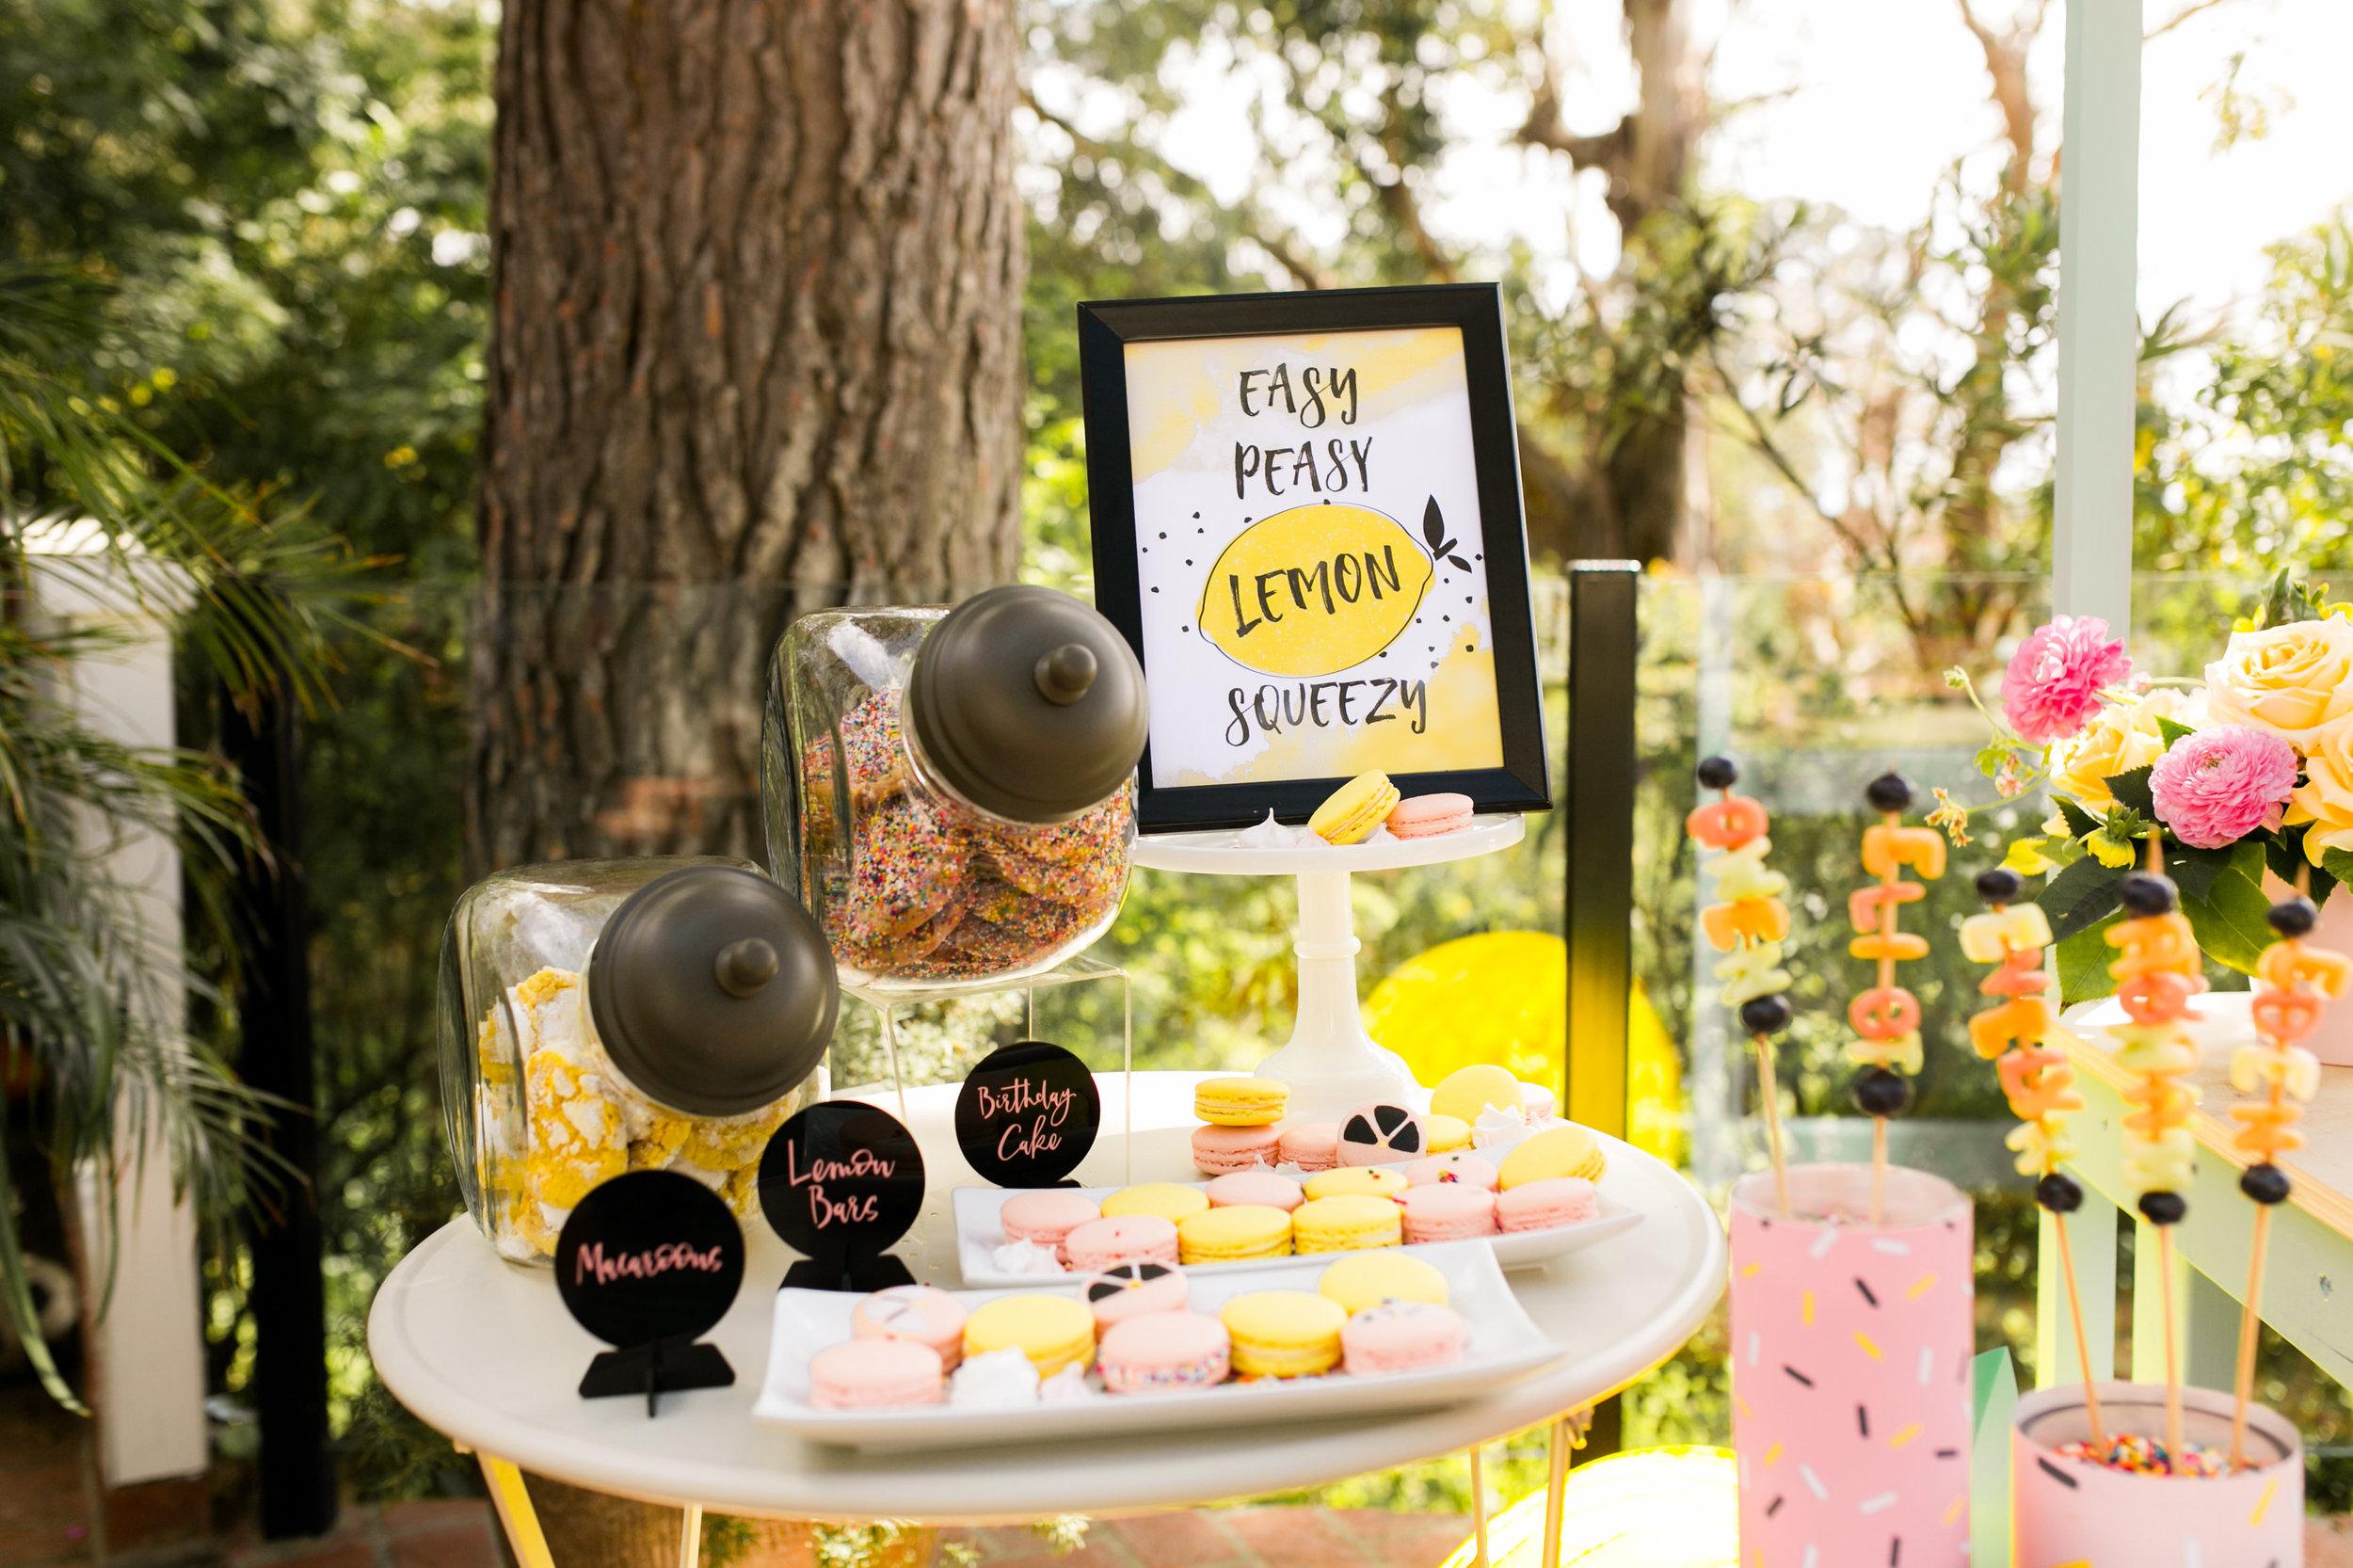 Lemonade Stand Kids Birthday Party Dessert Table